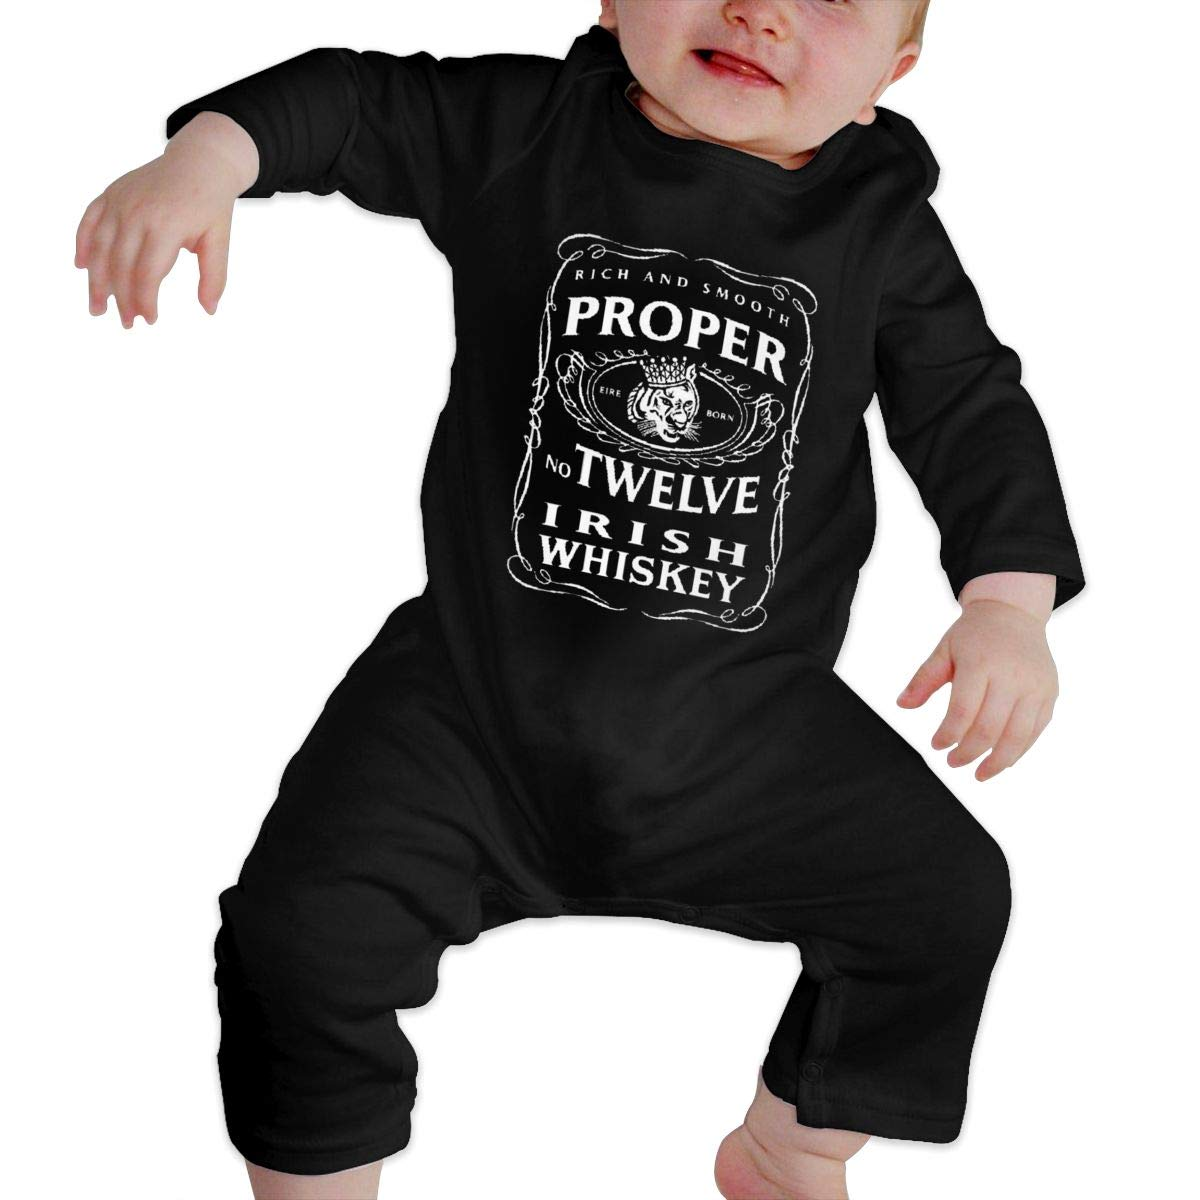 Fional Infant Long Sleeve Romper Irish Whiskey McGregor Newborn Babys 0-24M Organic Cotton Jumpsuit Outfit